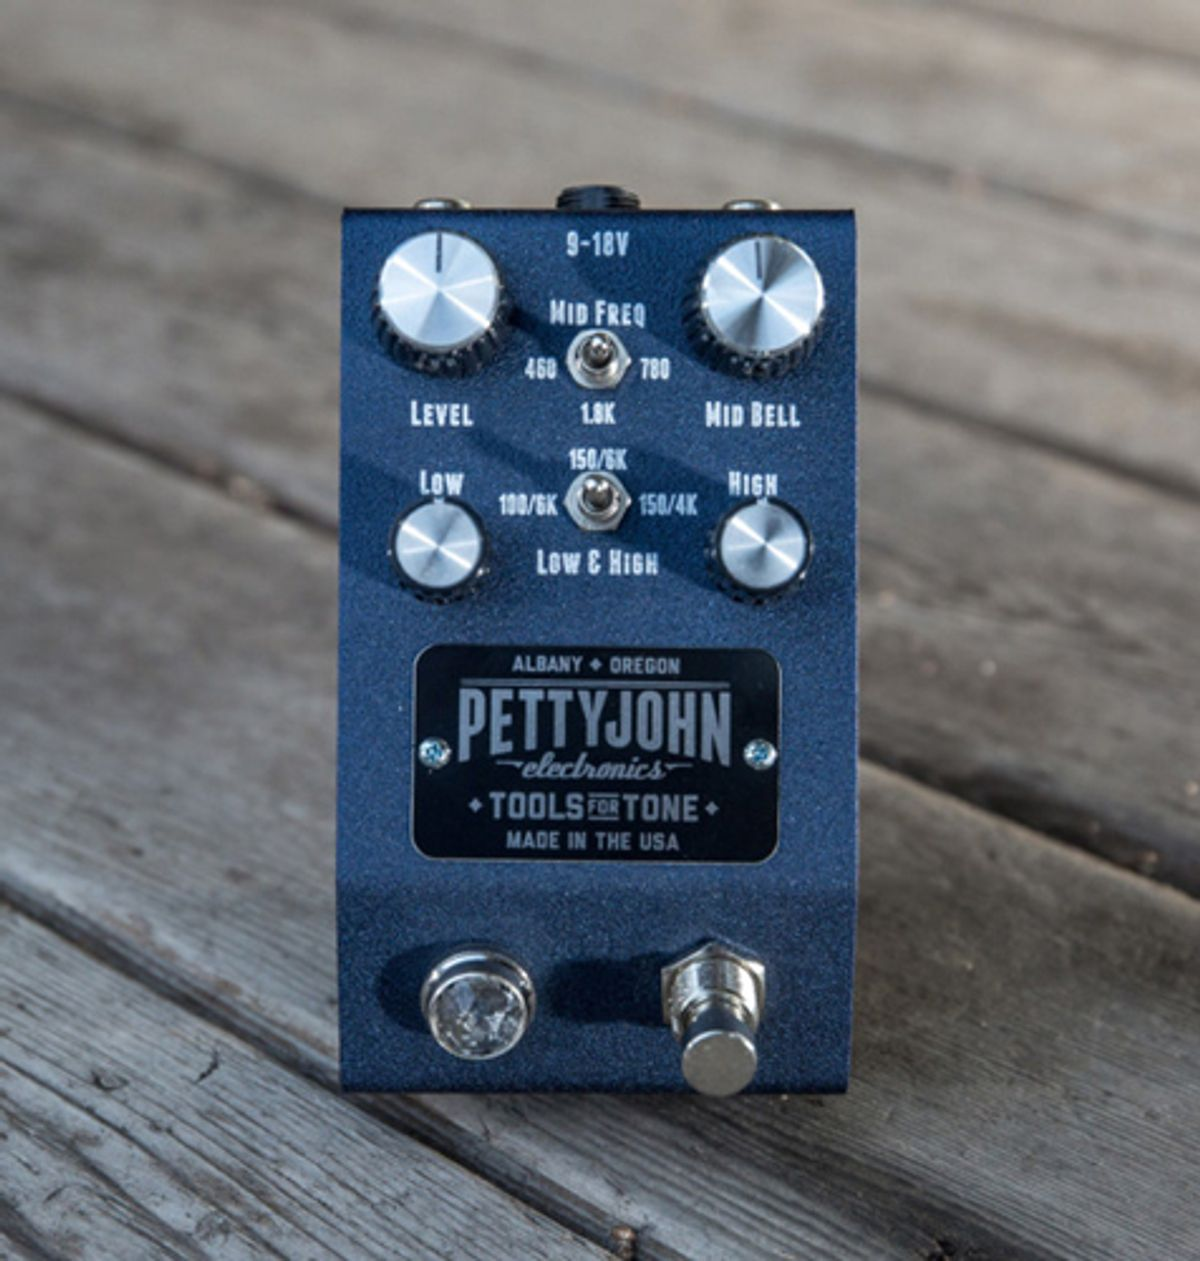 Pettyjohn Electronics Unleashes the Filter